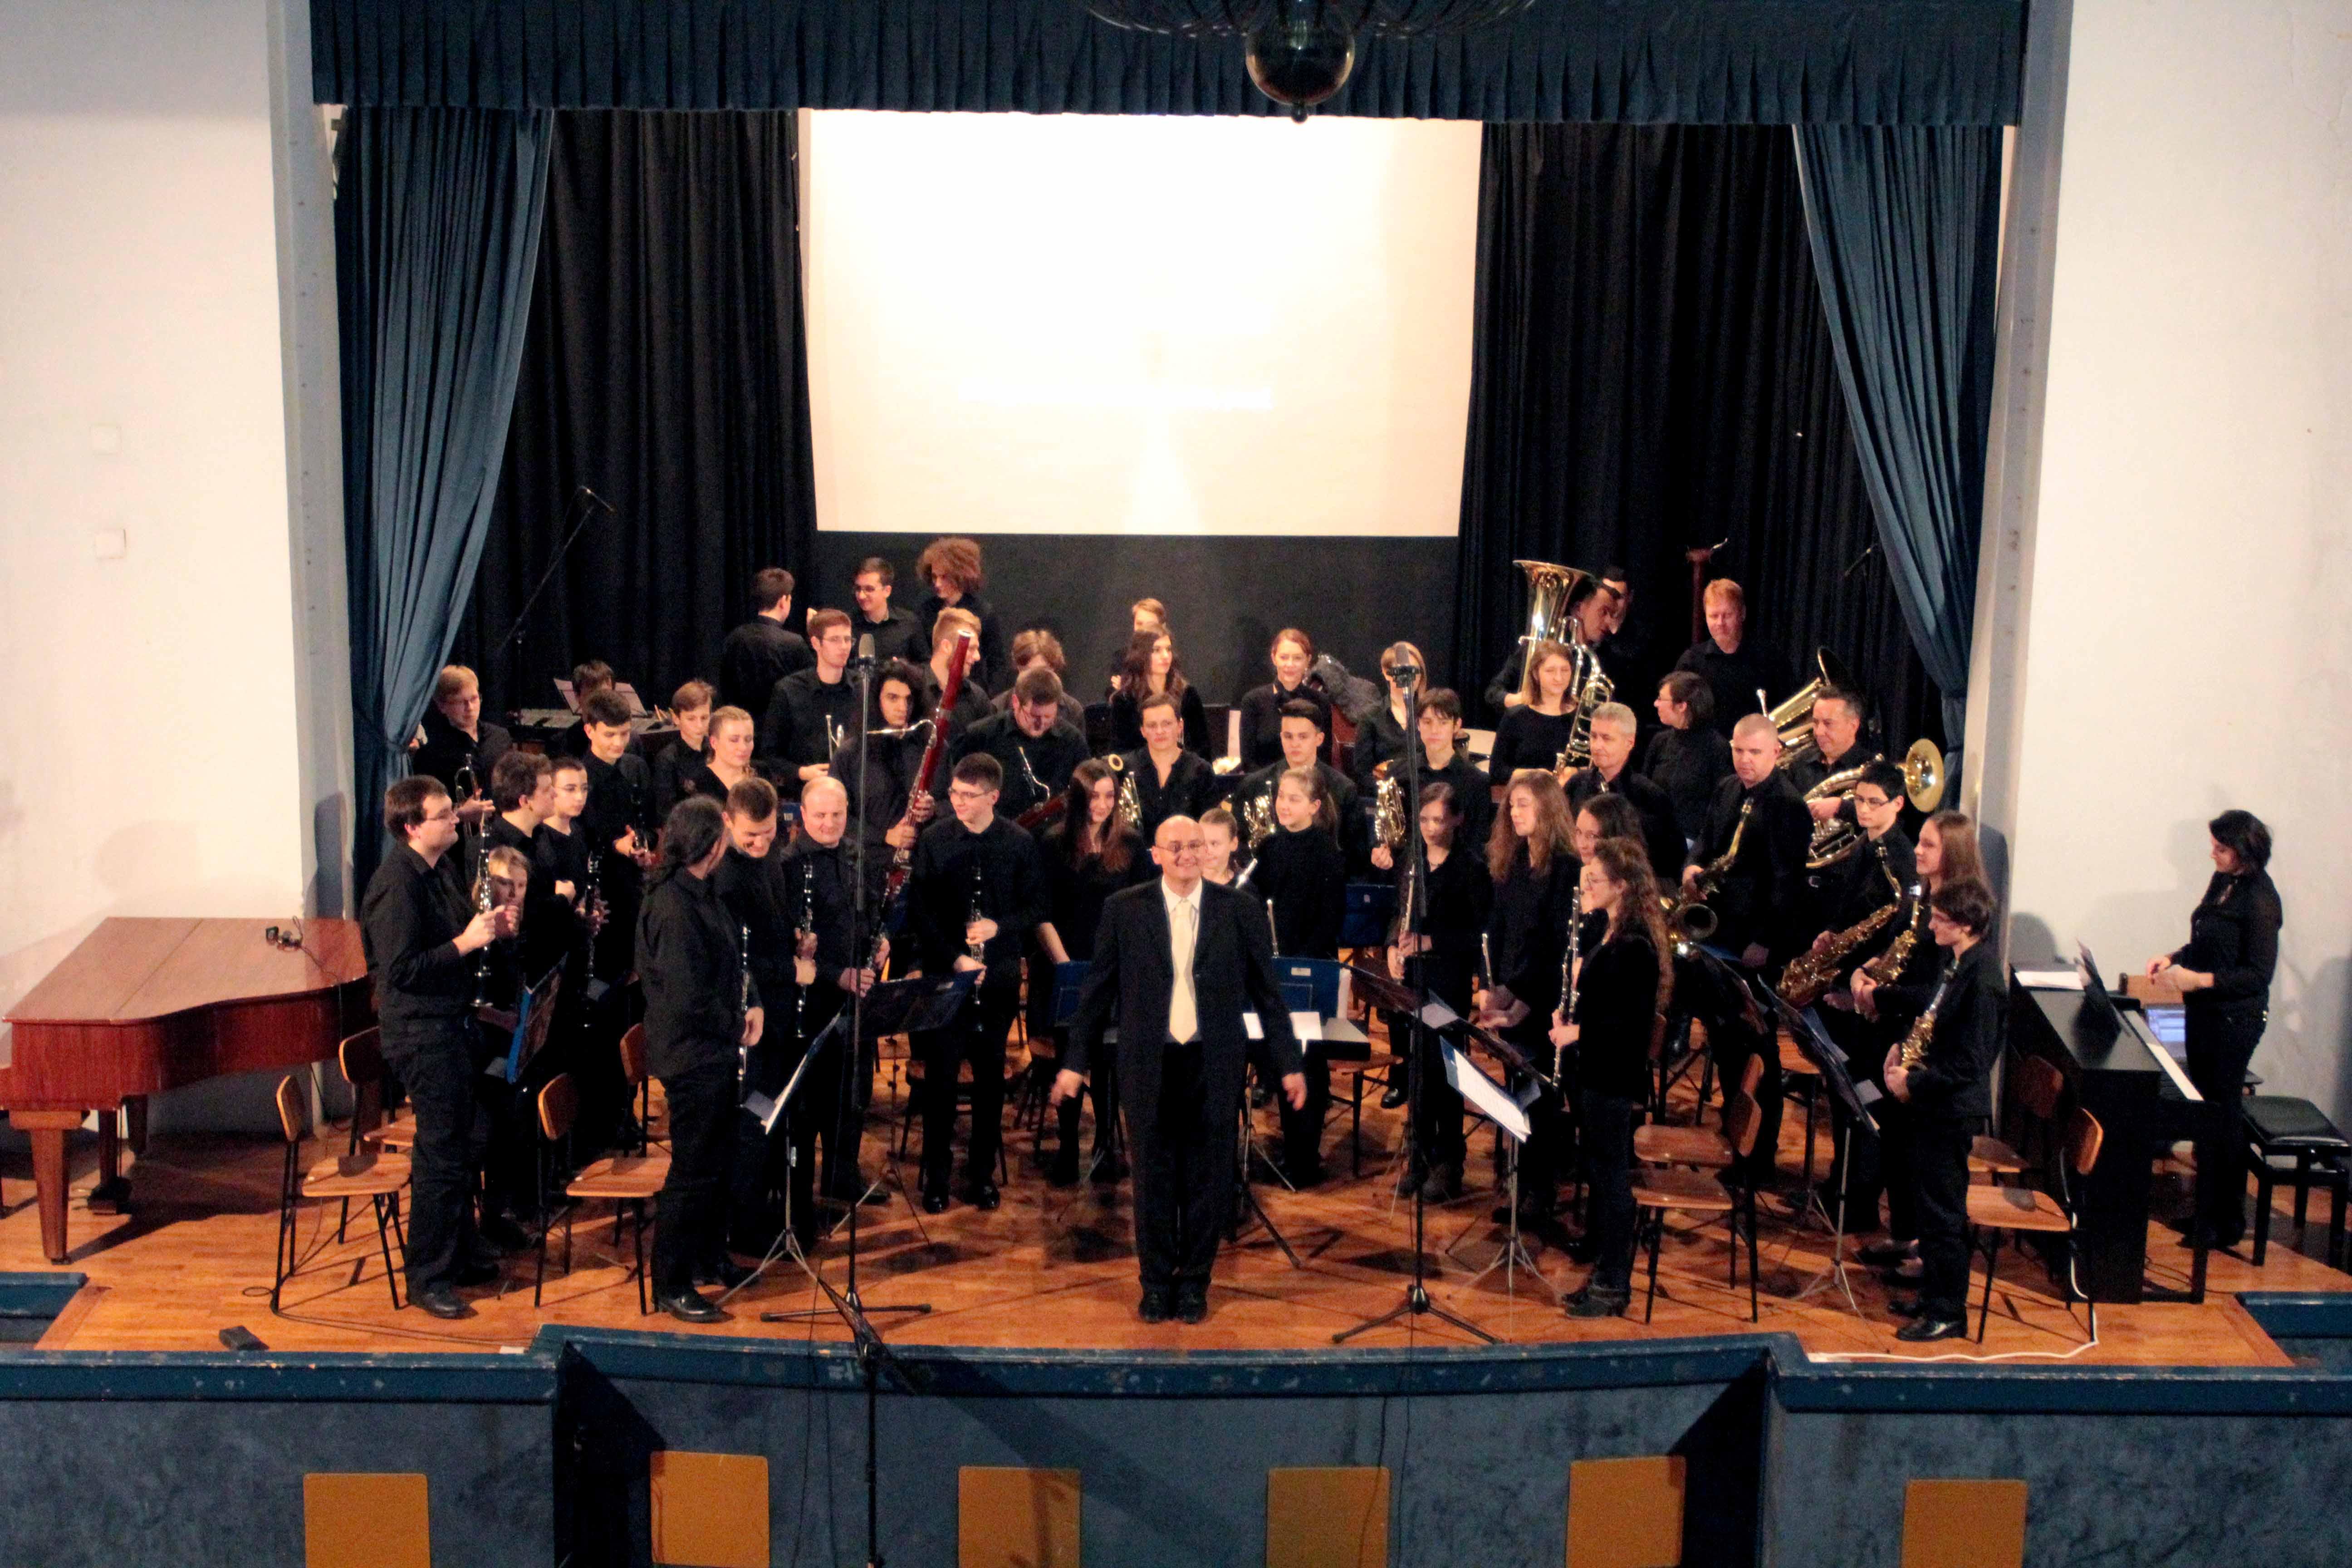 9-godisnji-koncert-puhacki-orkestar-2016-by-milan-mimi-petic